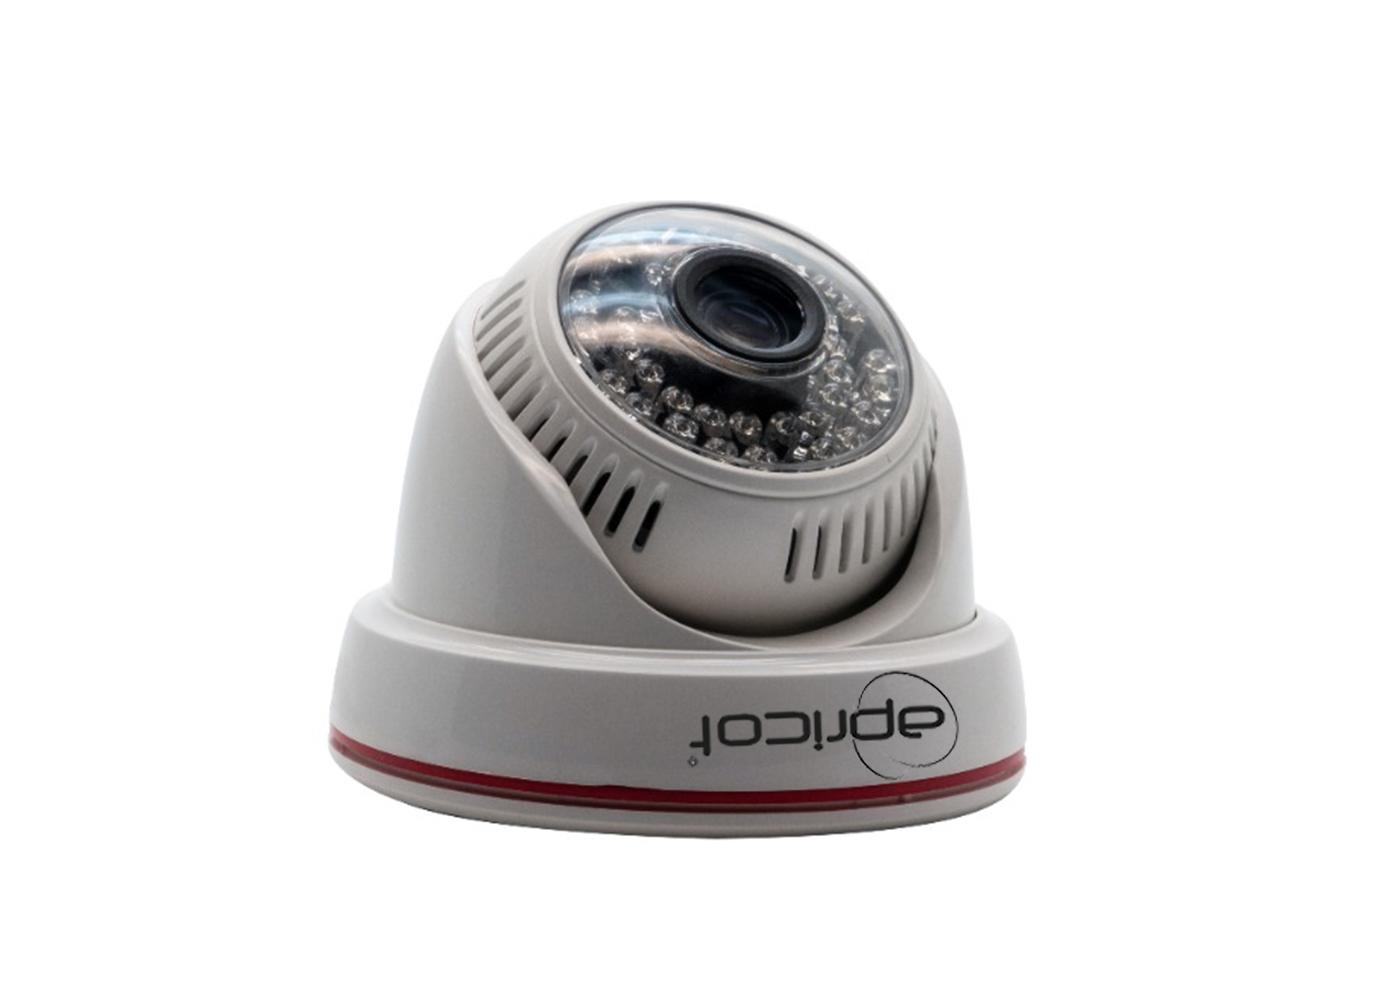 Apricot APD-36 AHD 2 Megapixel 3.6mm Plastik Dome Güvenlik Kamerası